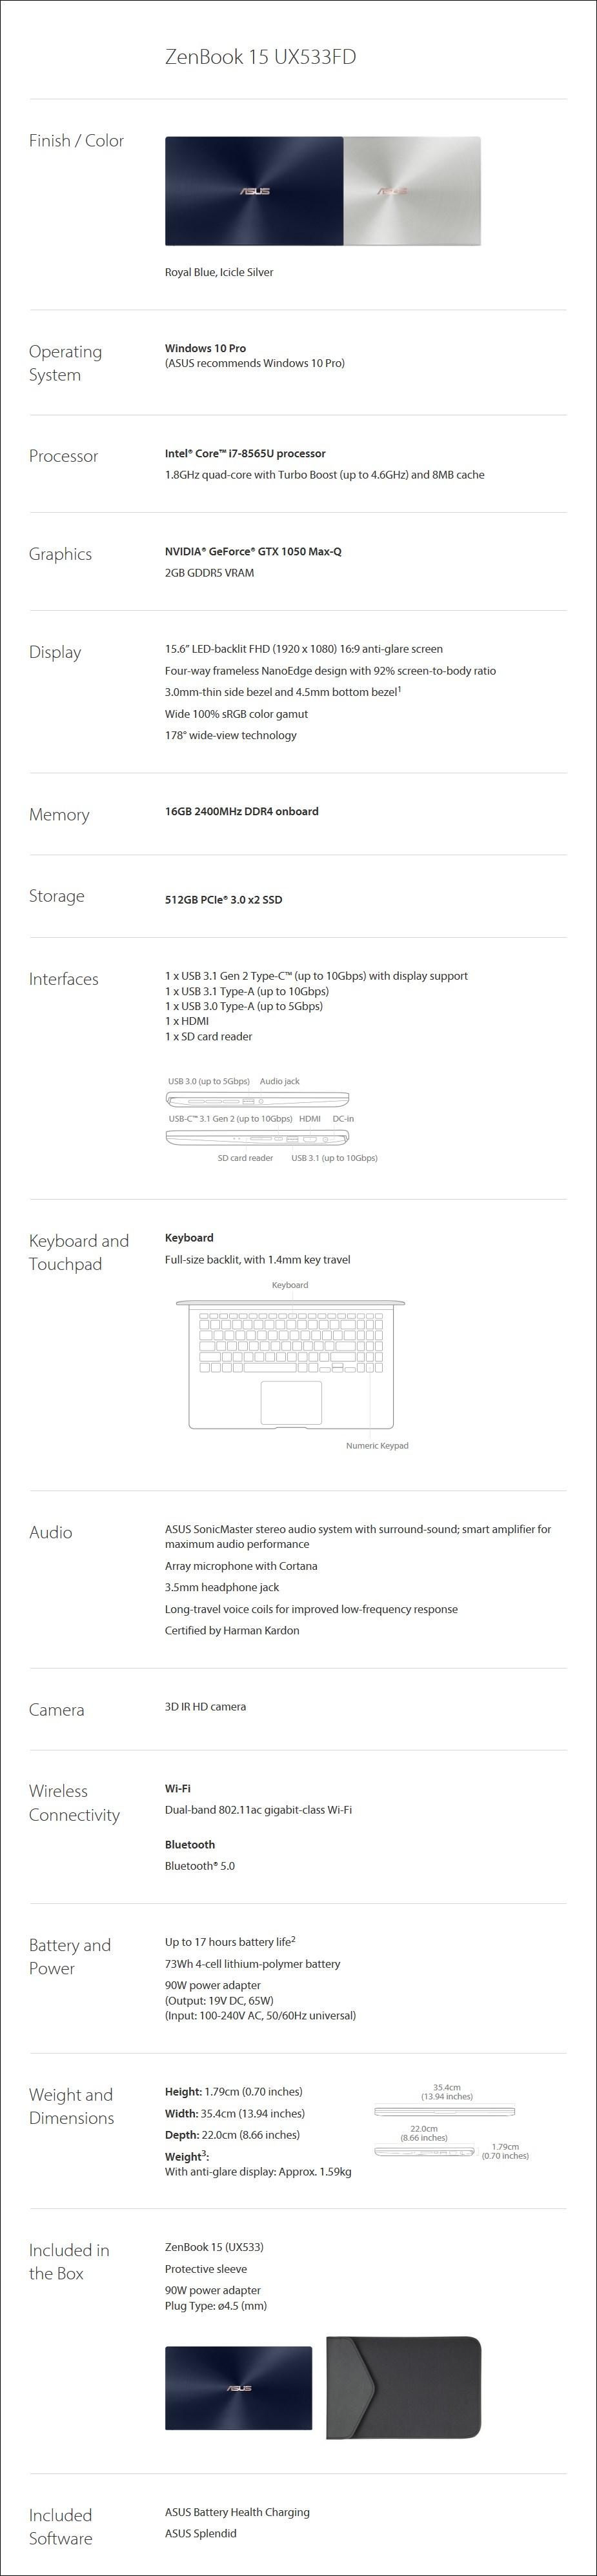 "ASUS ZenBook 15 UX533FD 15.6"" Laptop i7-8565U 16GB 512GB GTX1050 W10P - Blue - Overview 1"